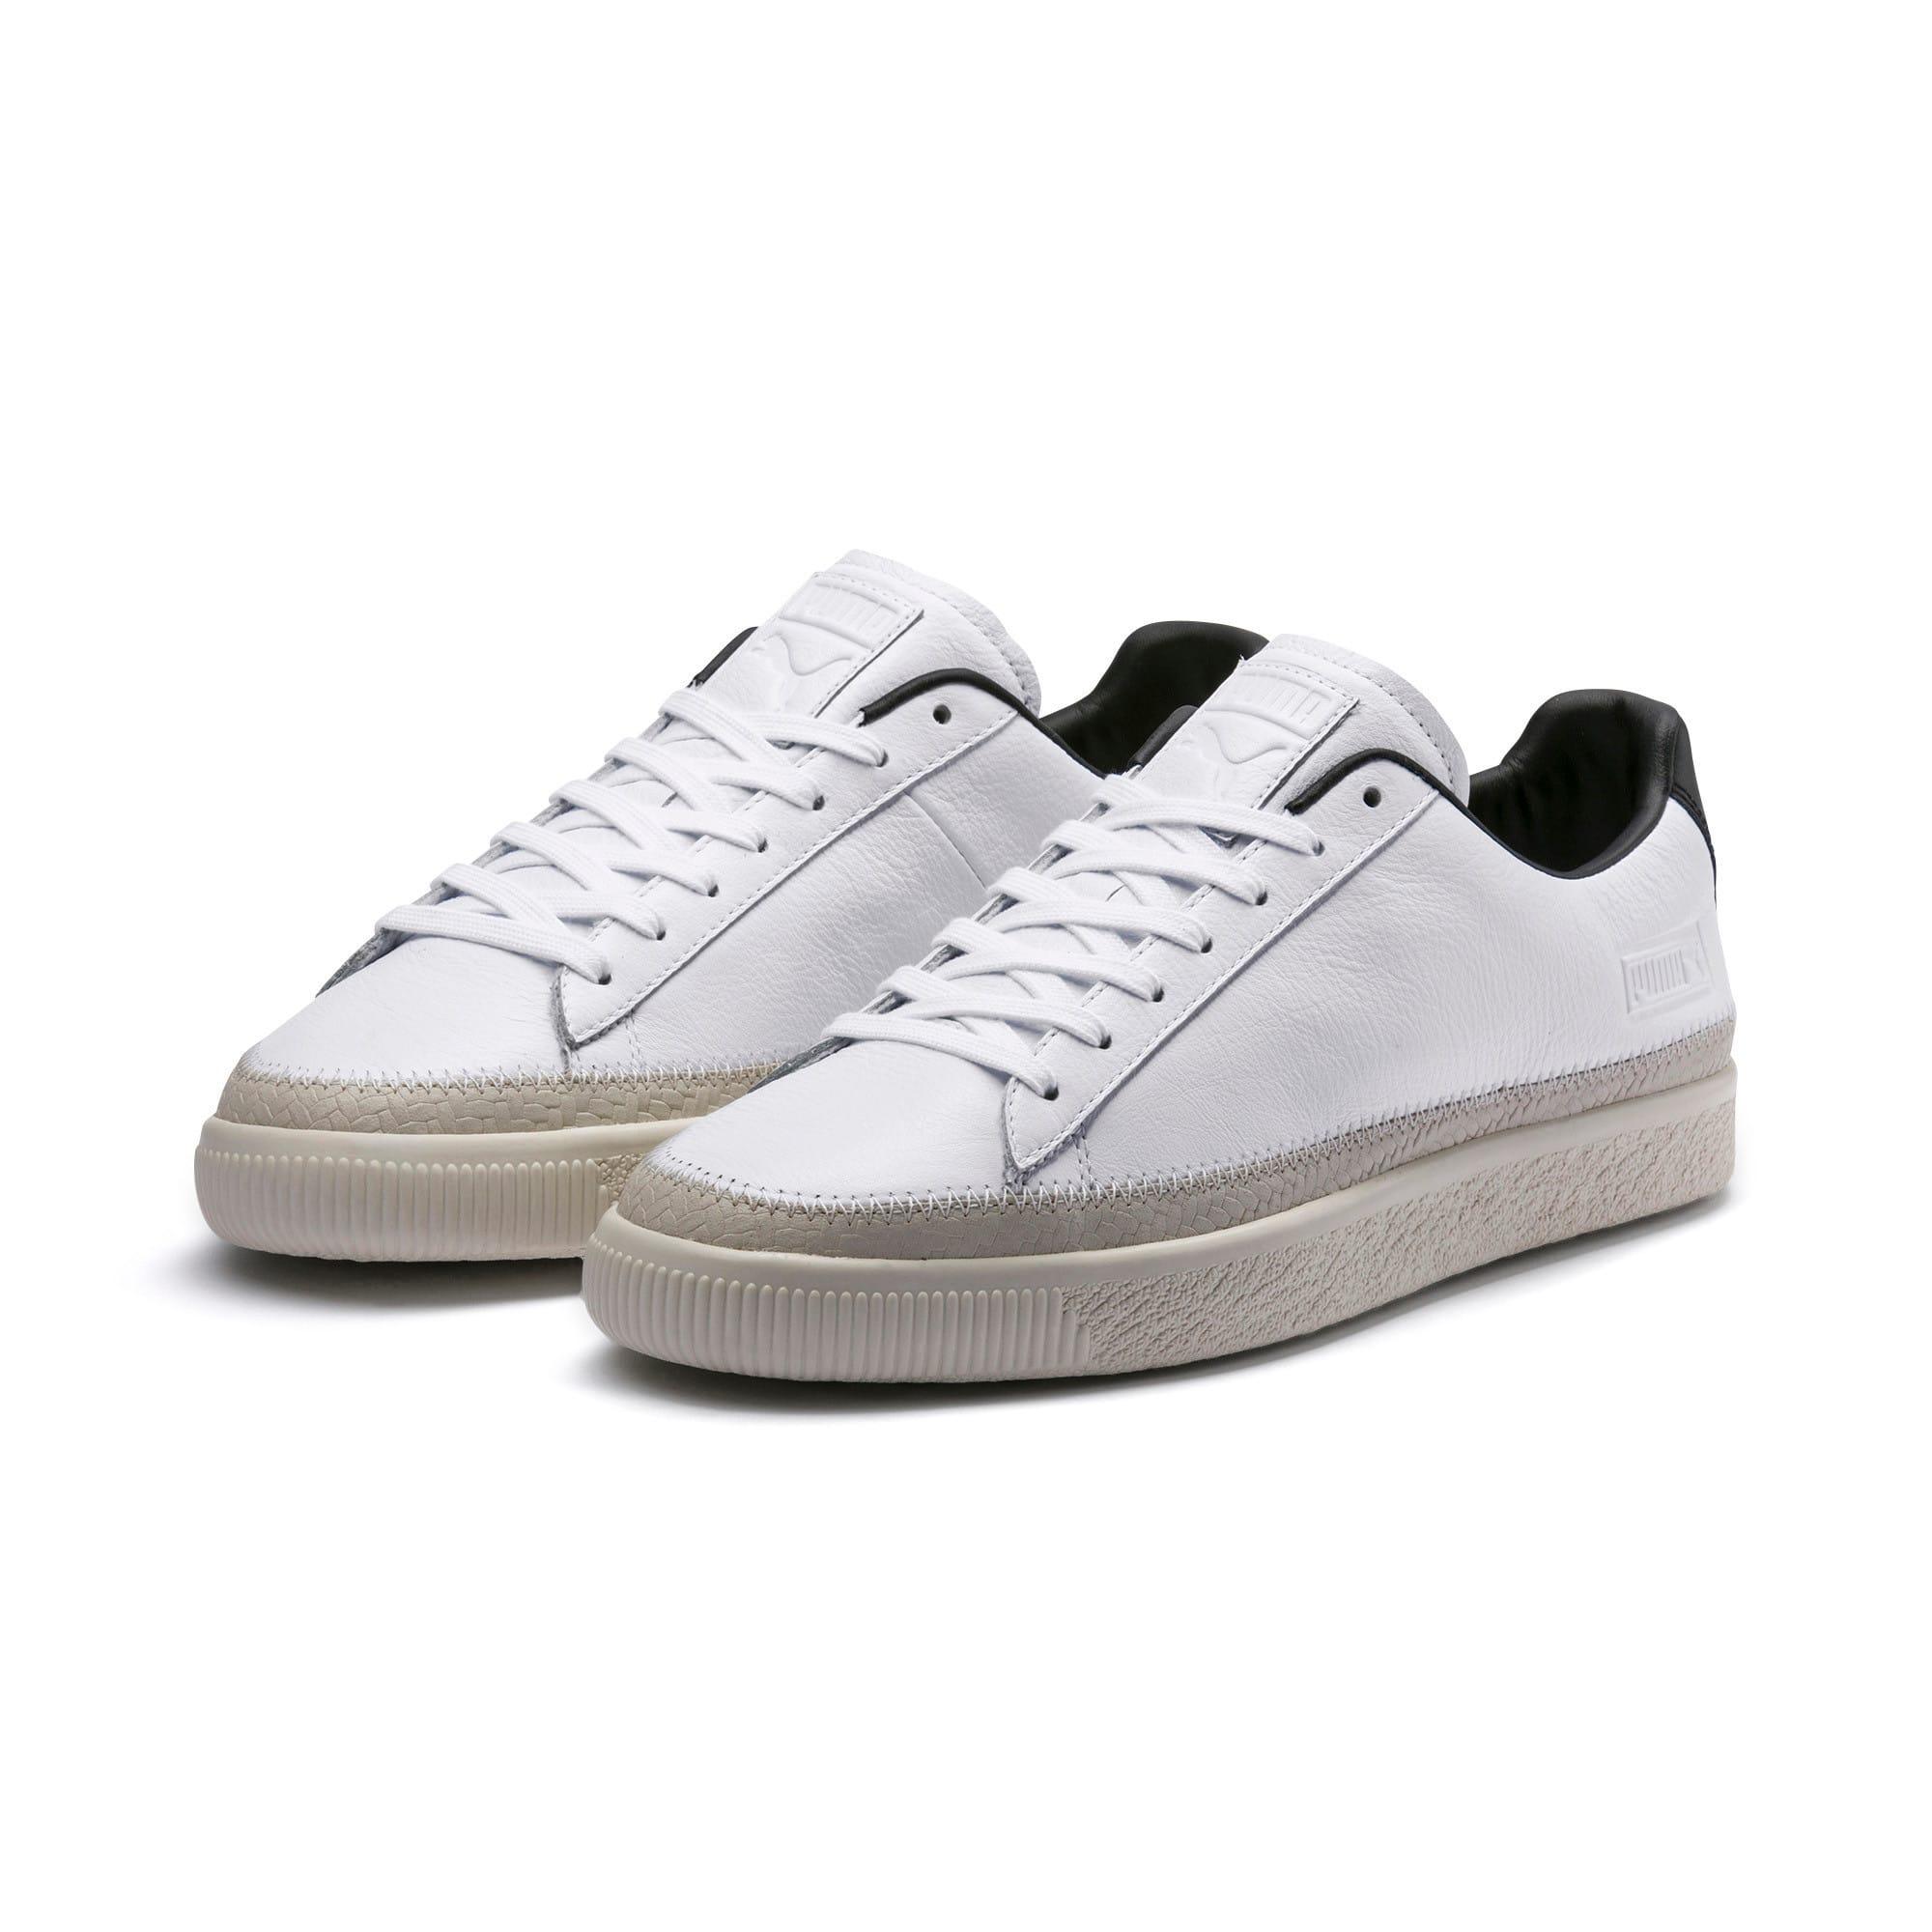 Thumbnail 8 of Basket Trim Shoes, Puma White-Whisper W-Black, medium-IND